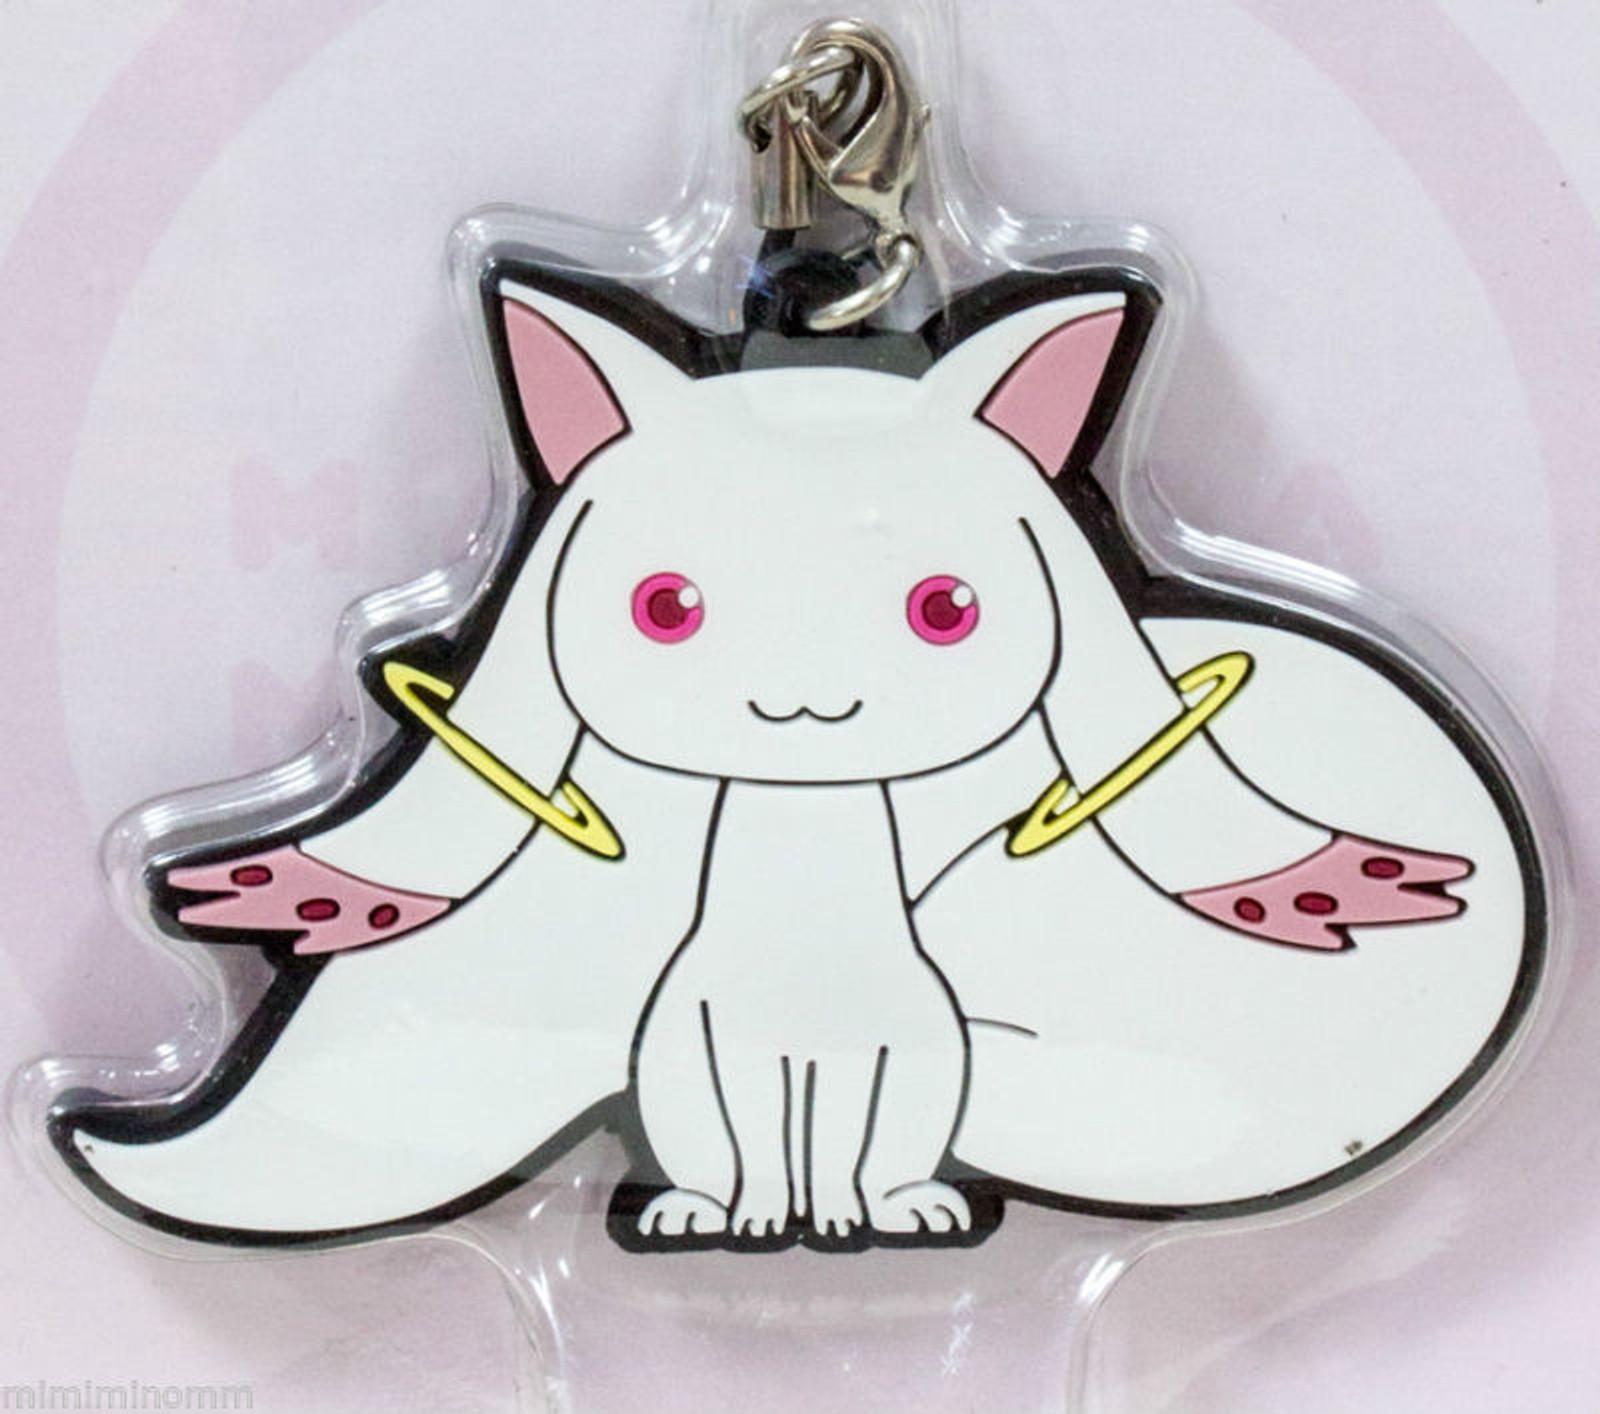 Puella Magi Madoka Magica Kyubey Rubber Strap JAPAN ANIME MANGA CAT